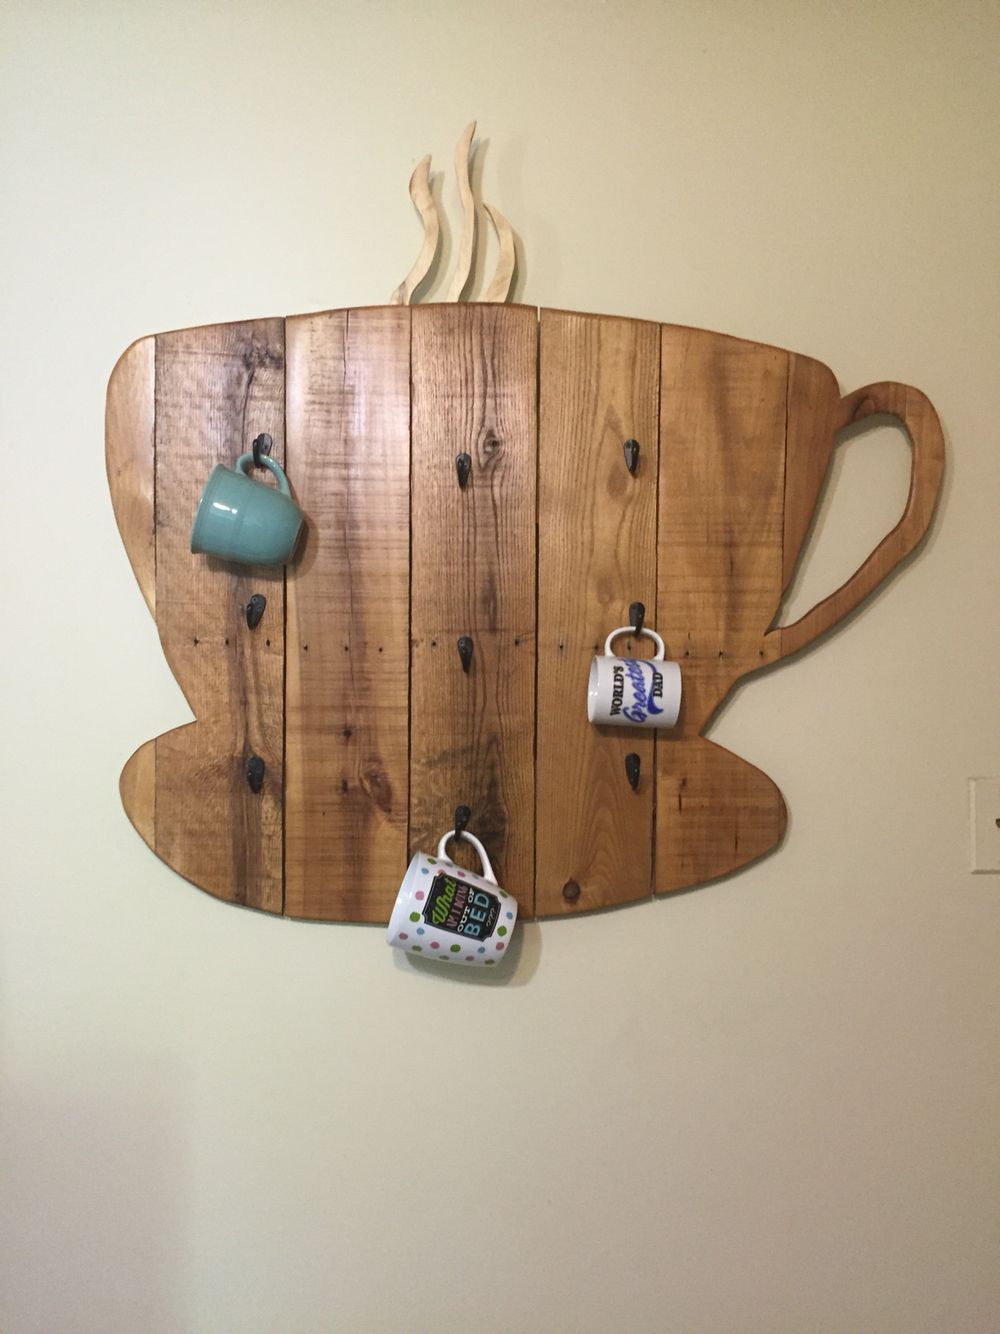 DIY Birdhouse, Rusty tools, Coffee cup holder. Re Use